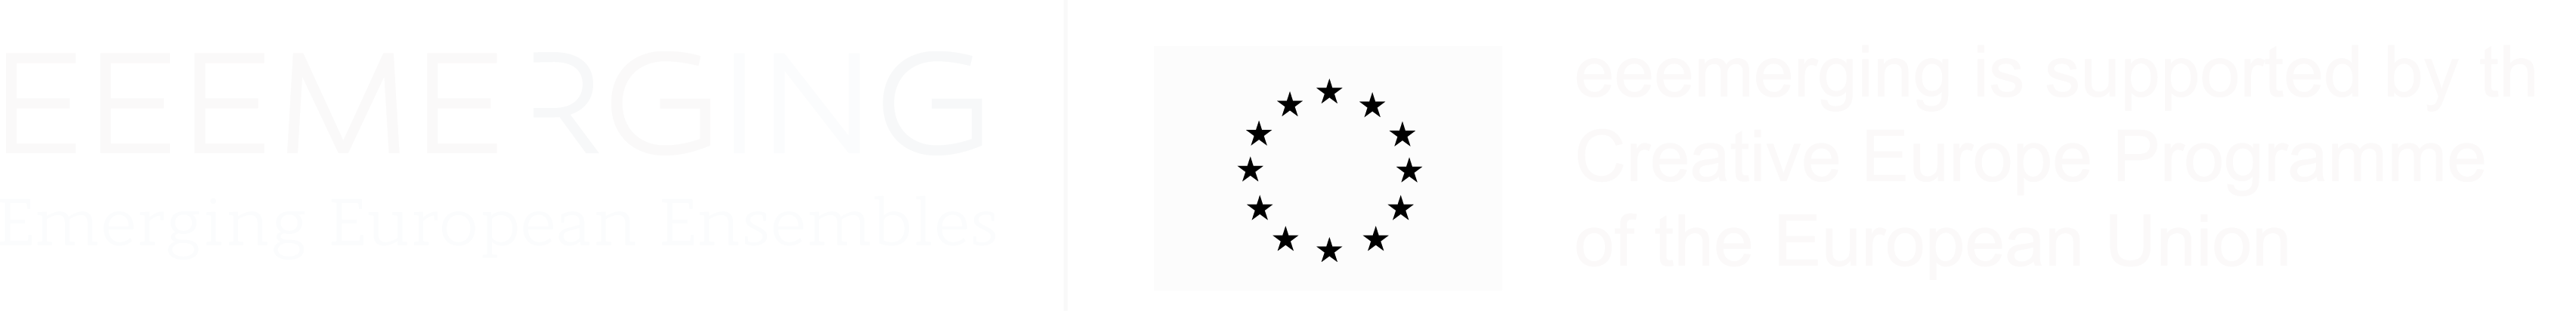 Eeemerging europe